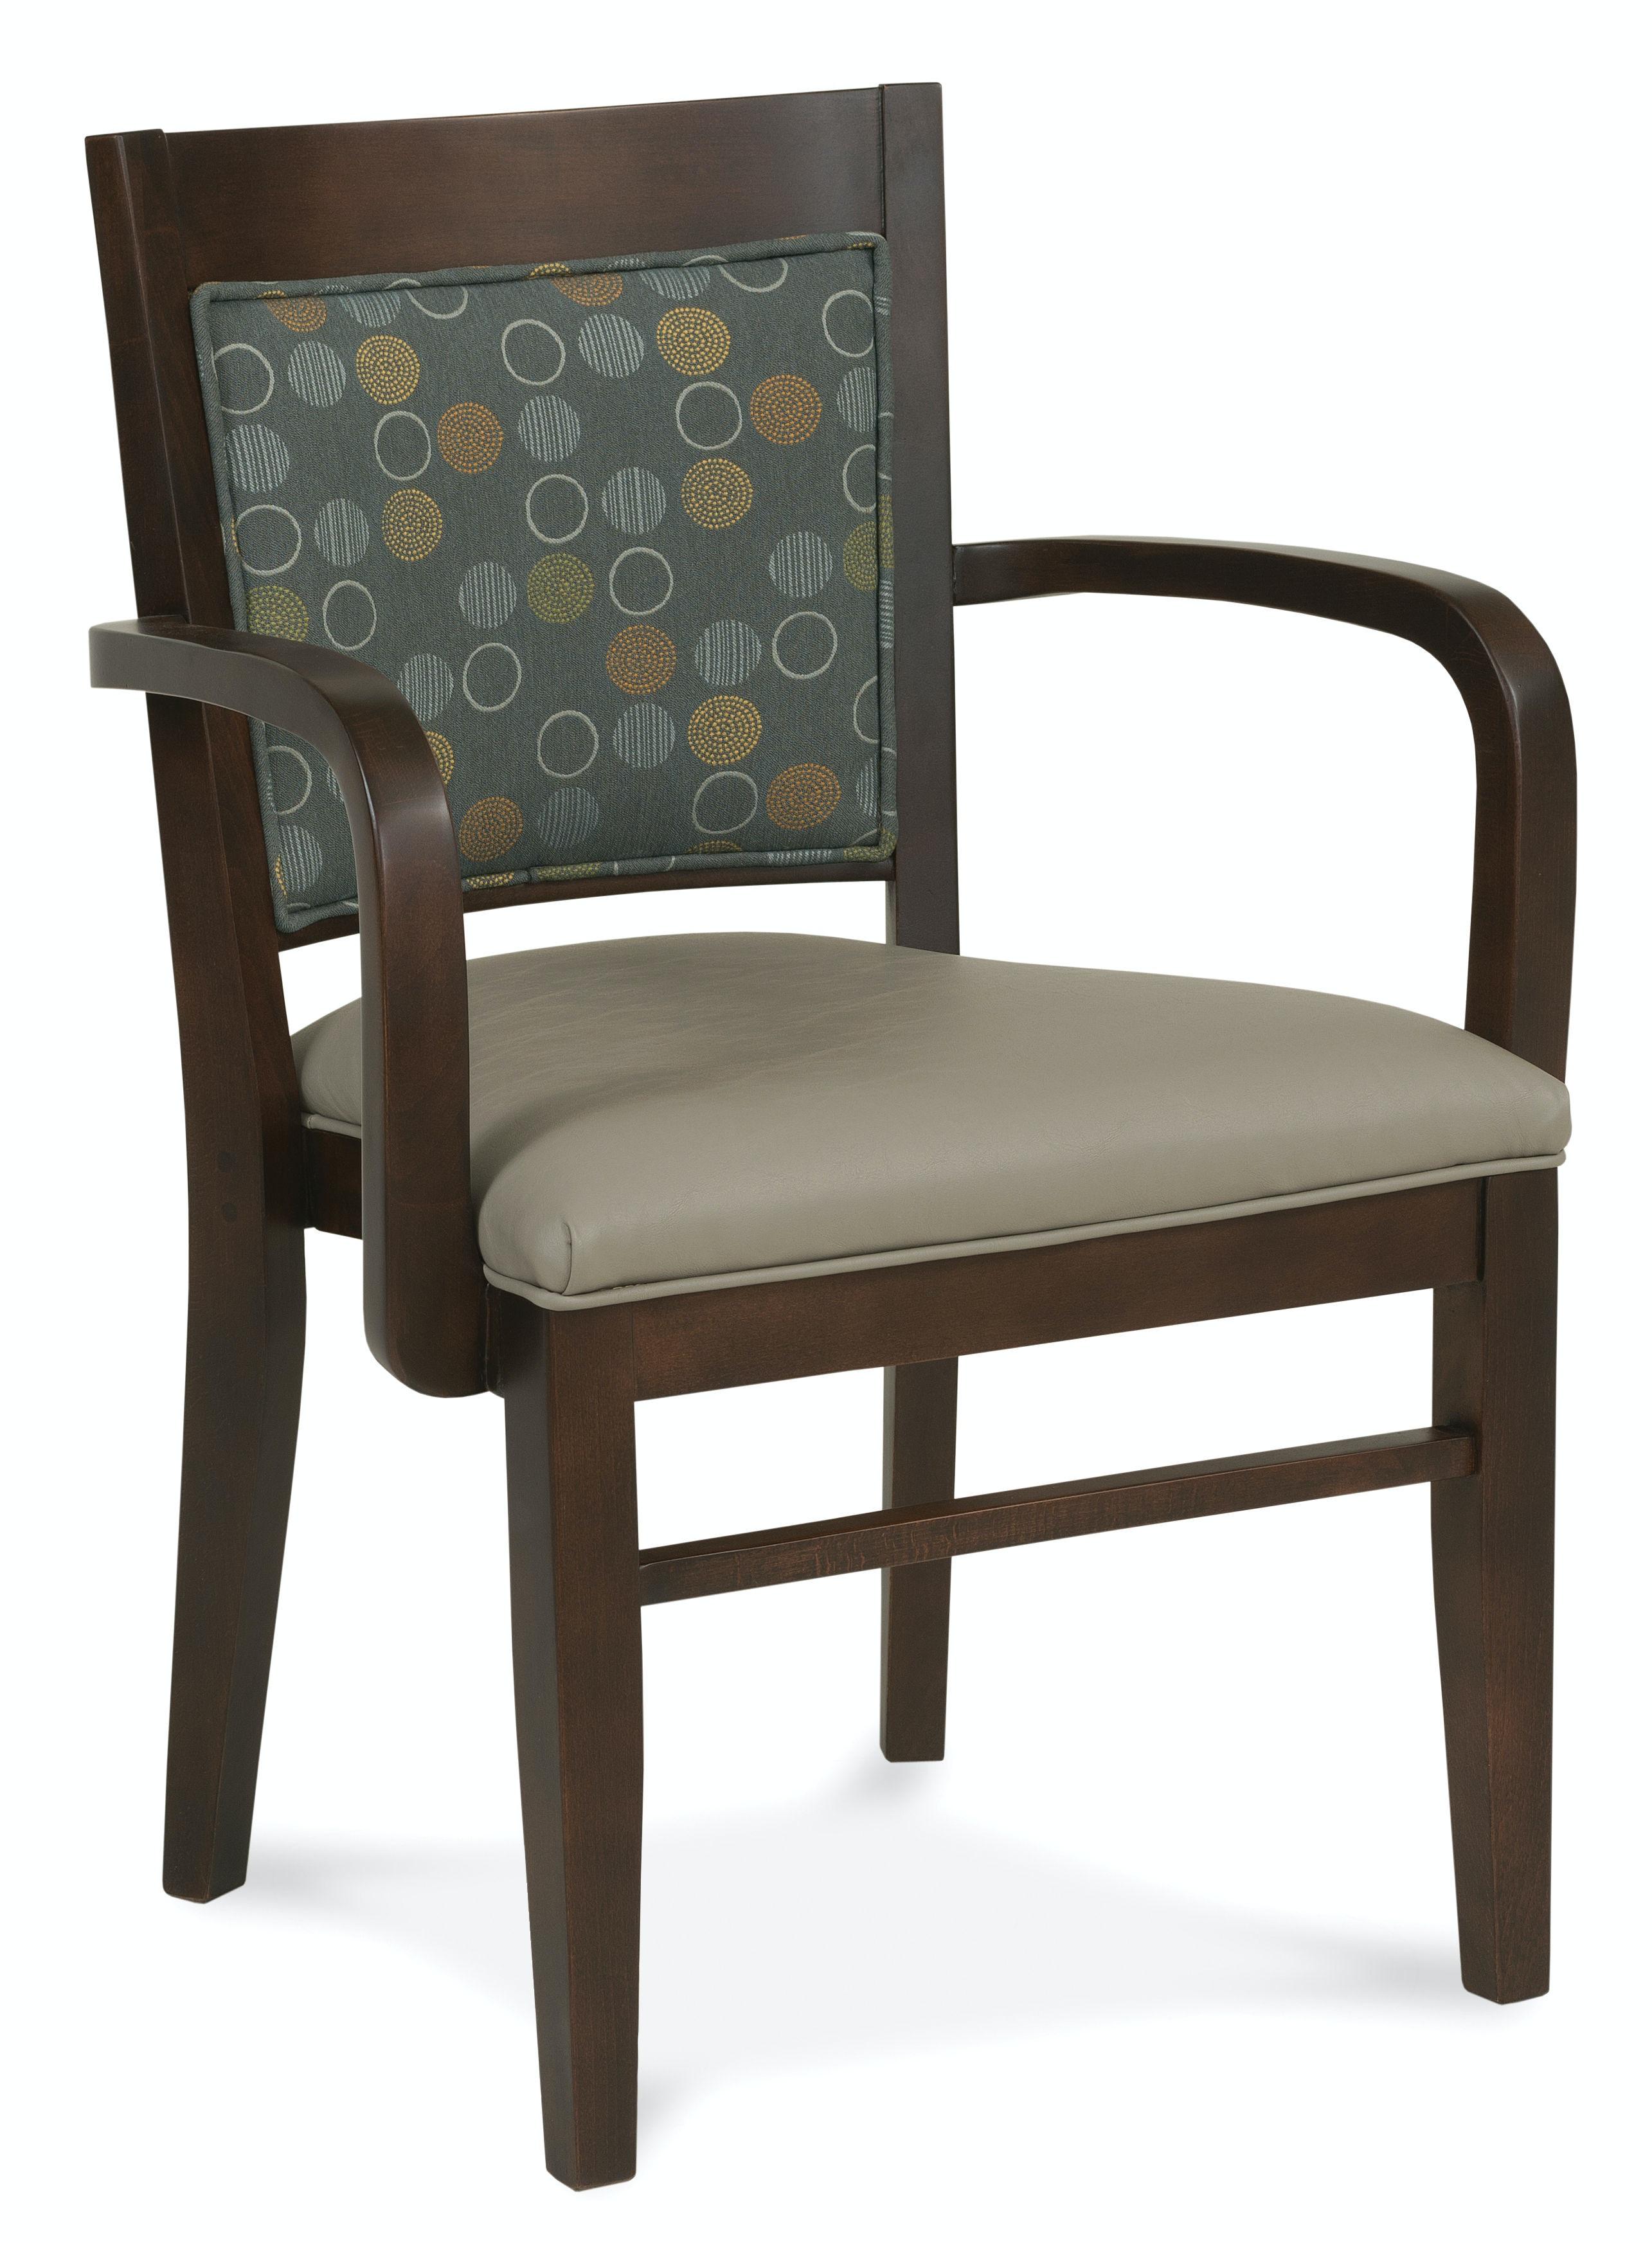 Fairfield Chair Company Arm Stack Chair 8746 11